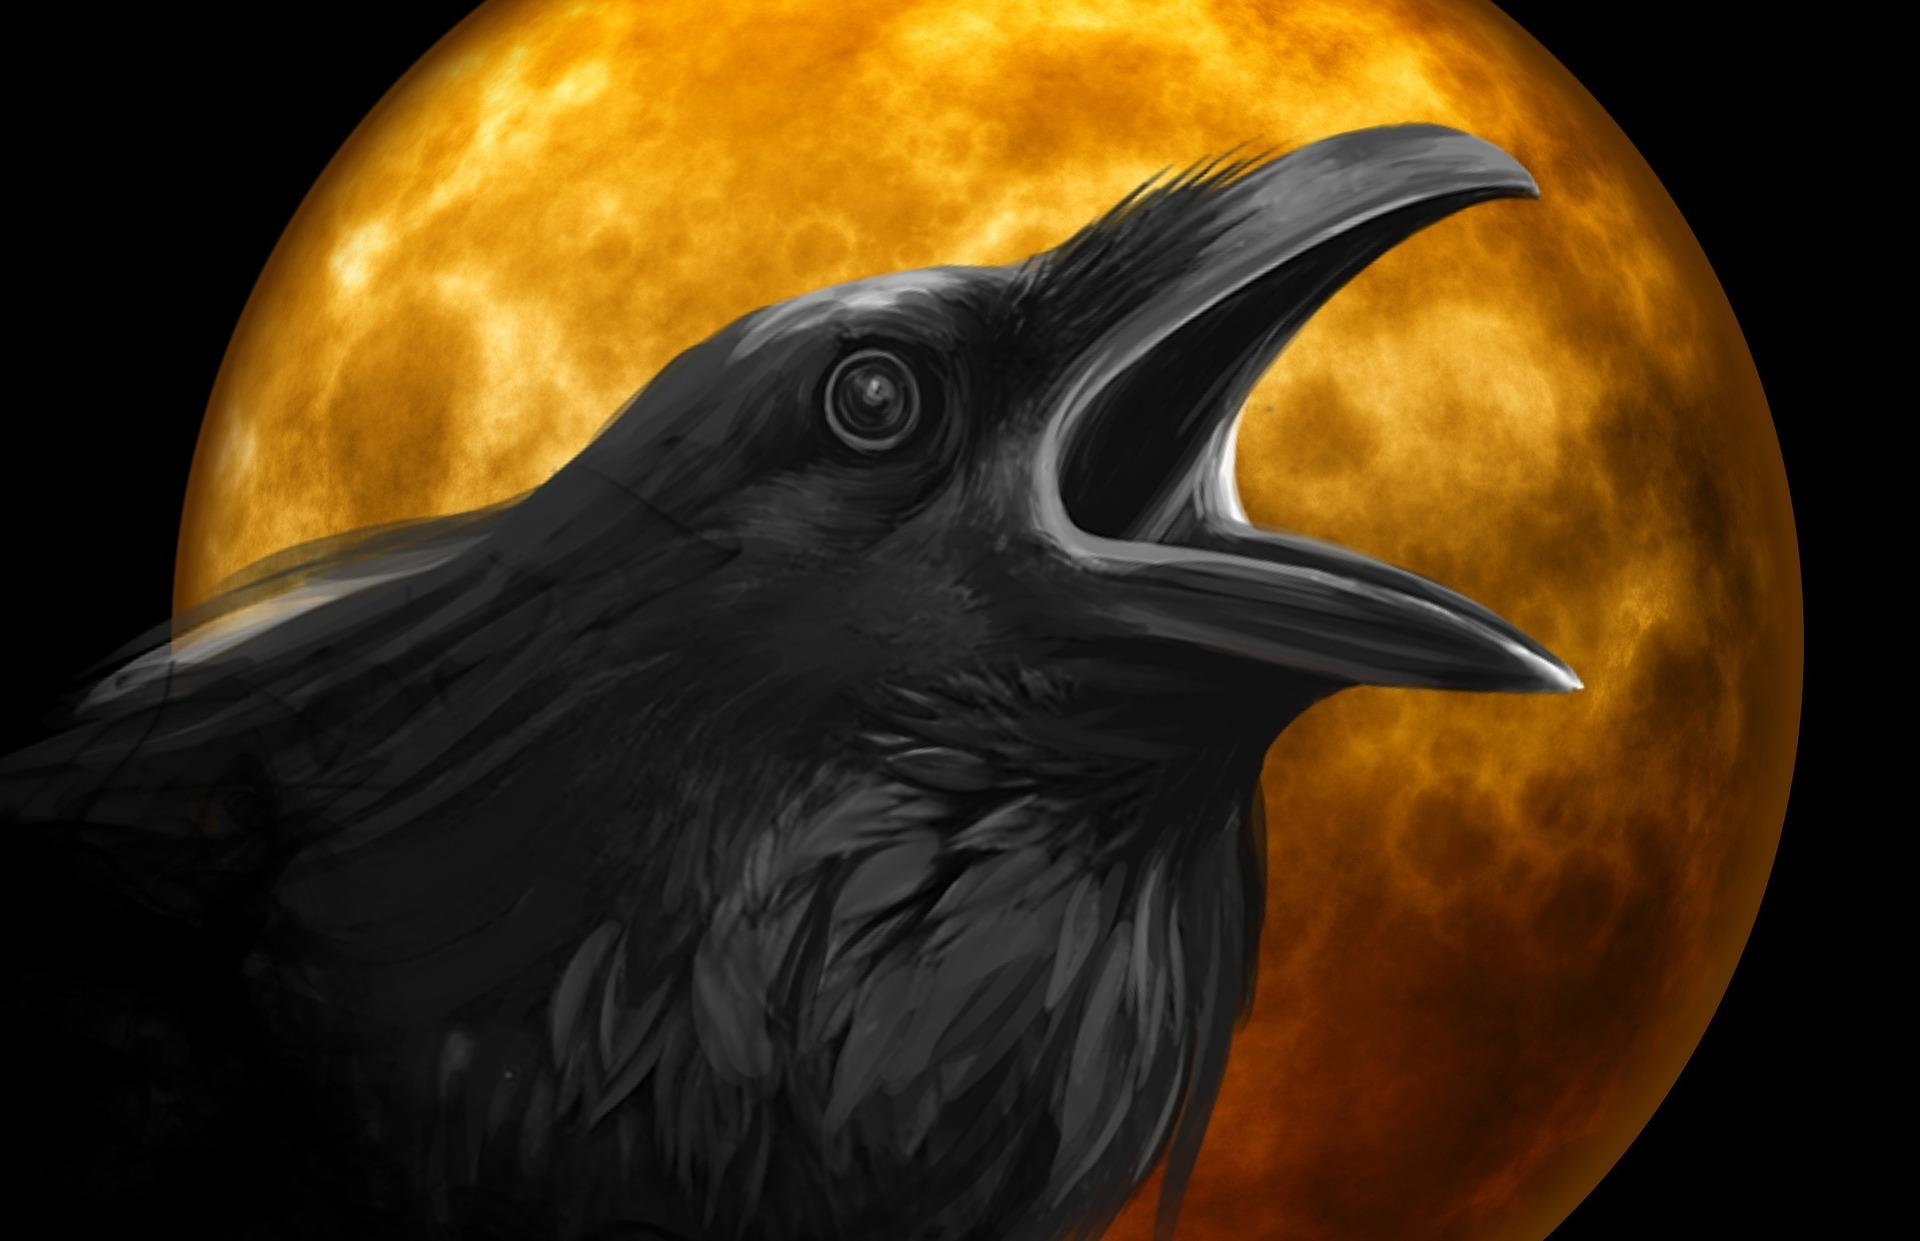 Raven scare crow